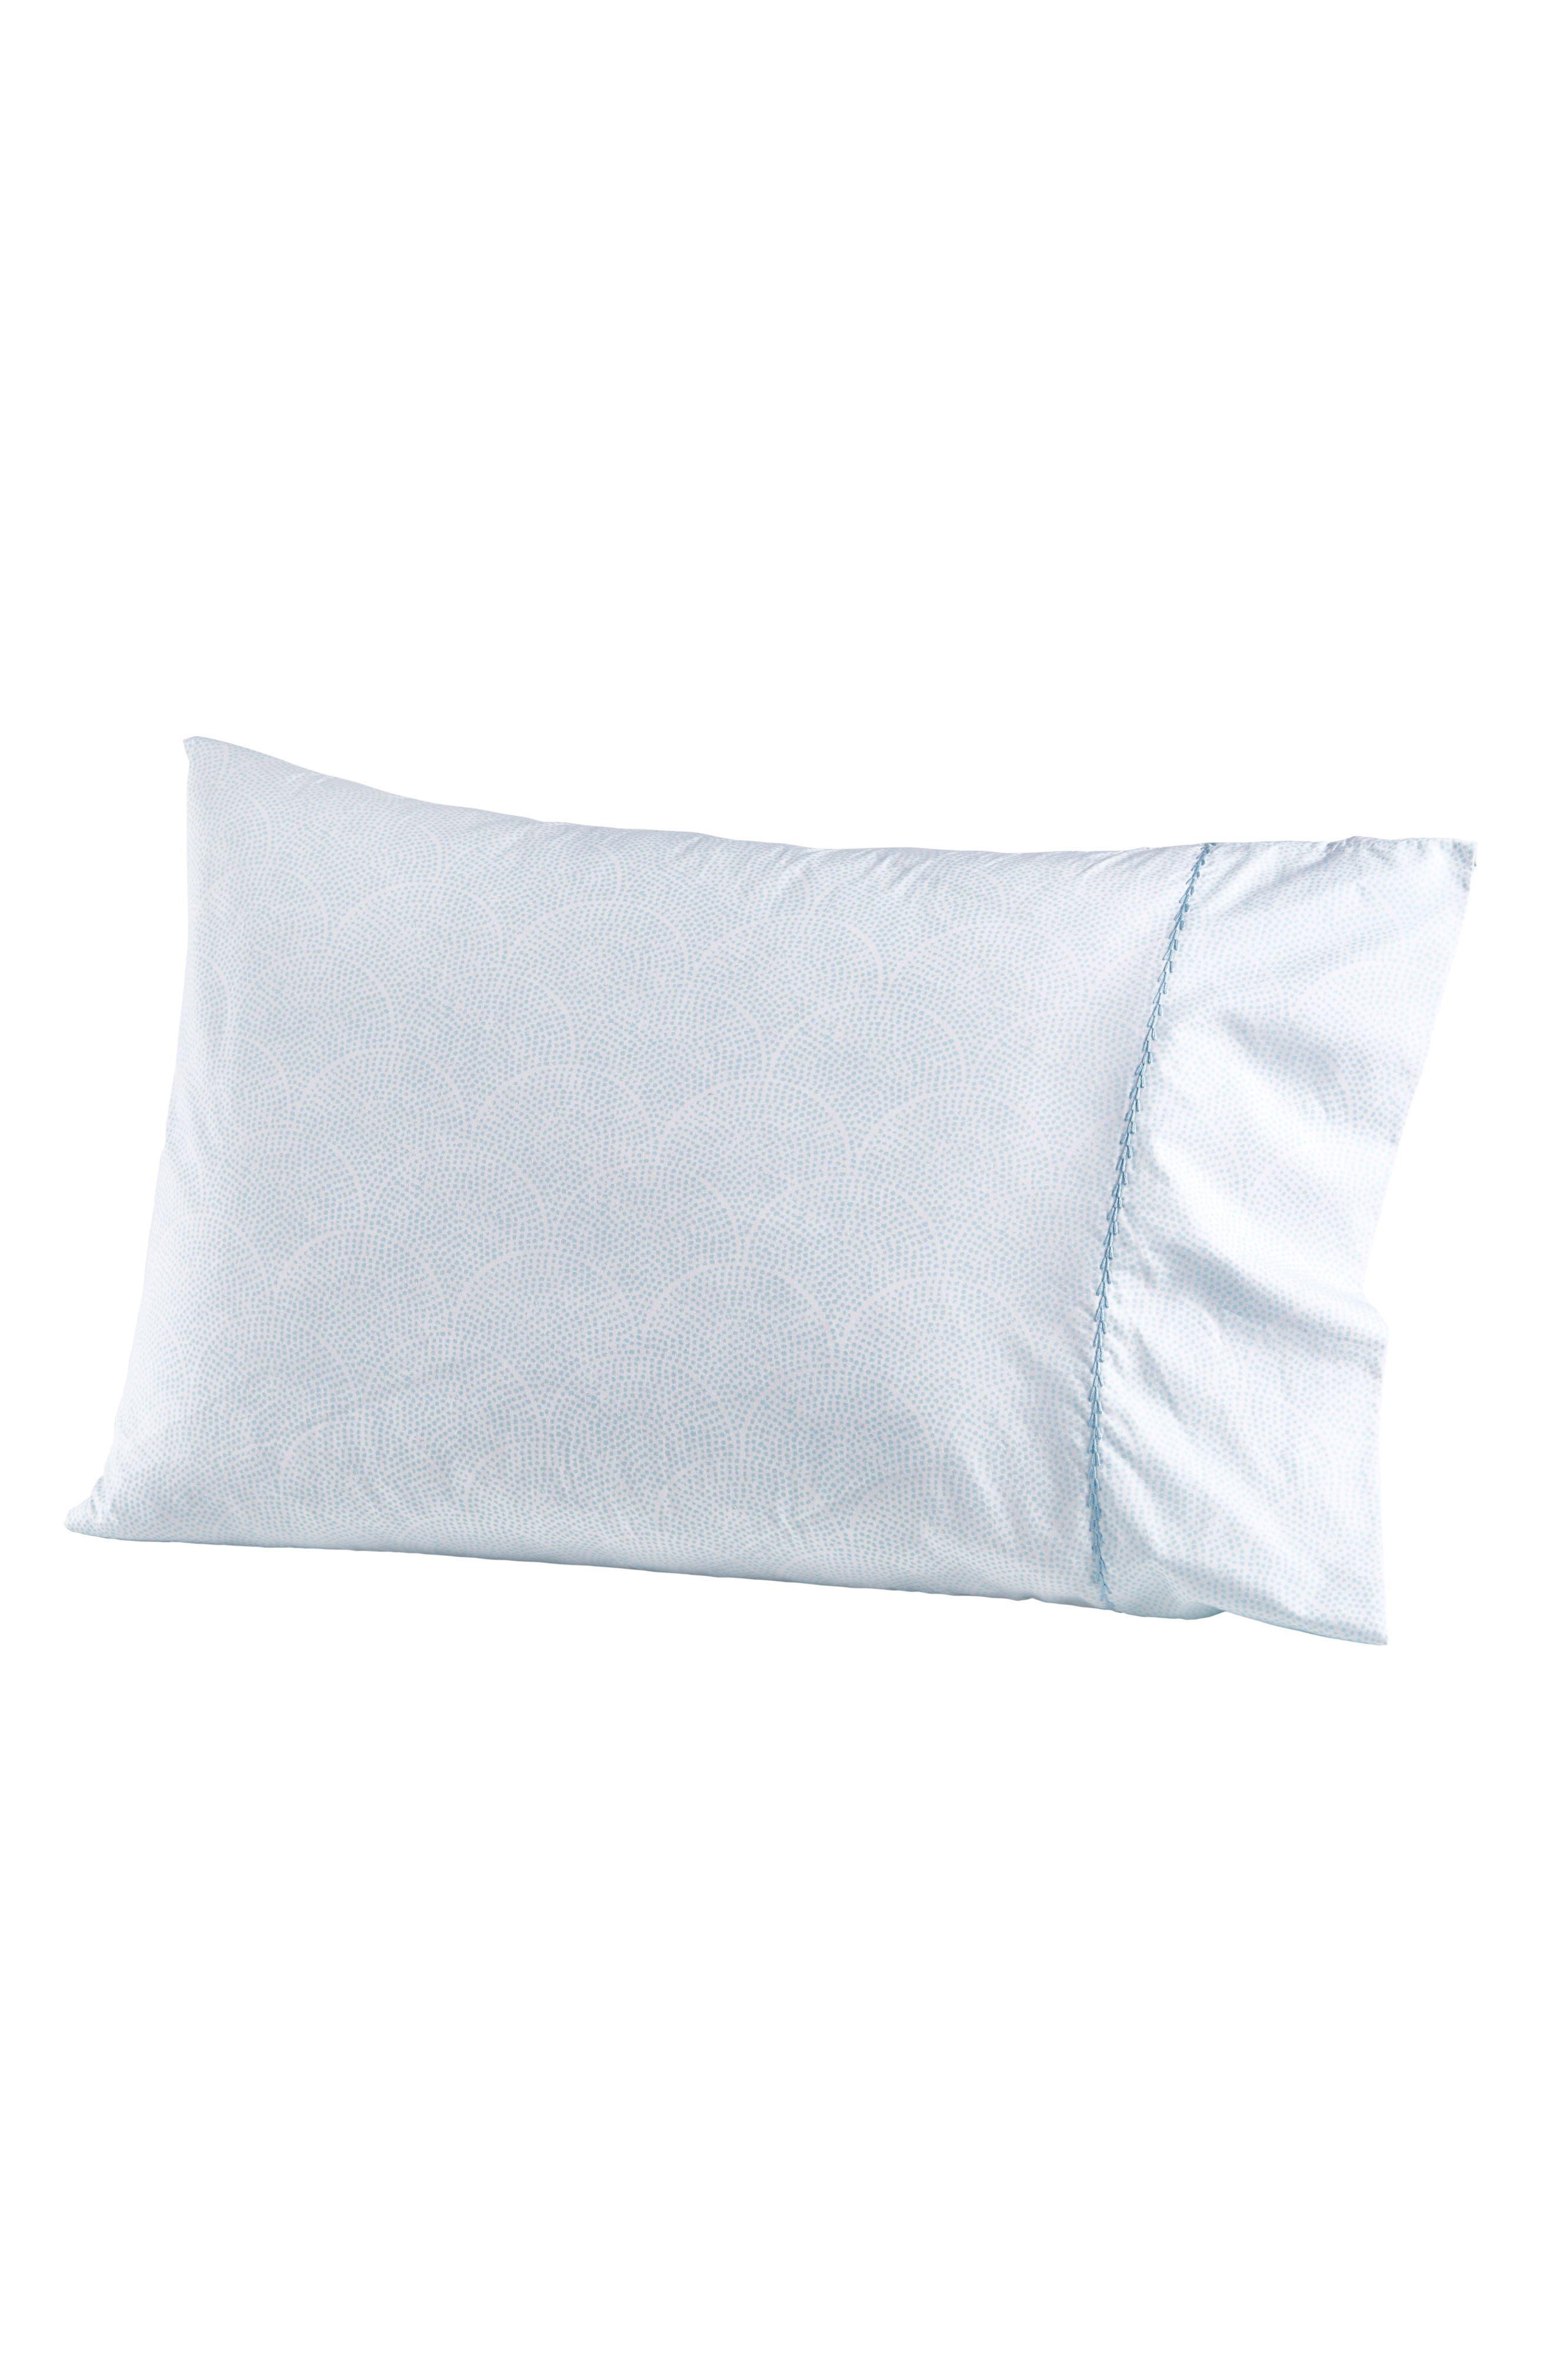 John Robshaw Vatula 400 Thread Count Pillowcases